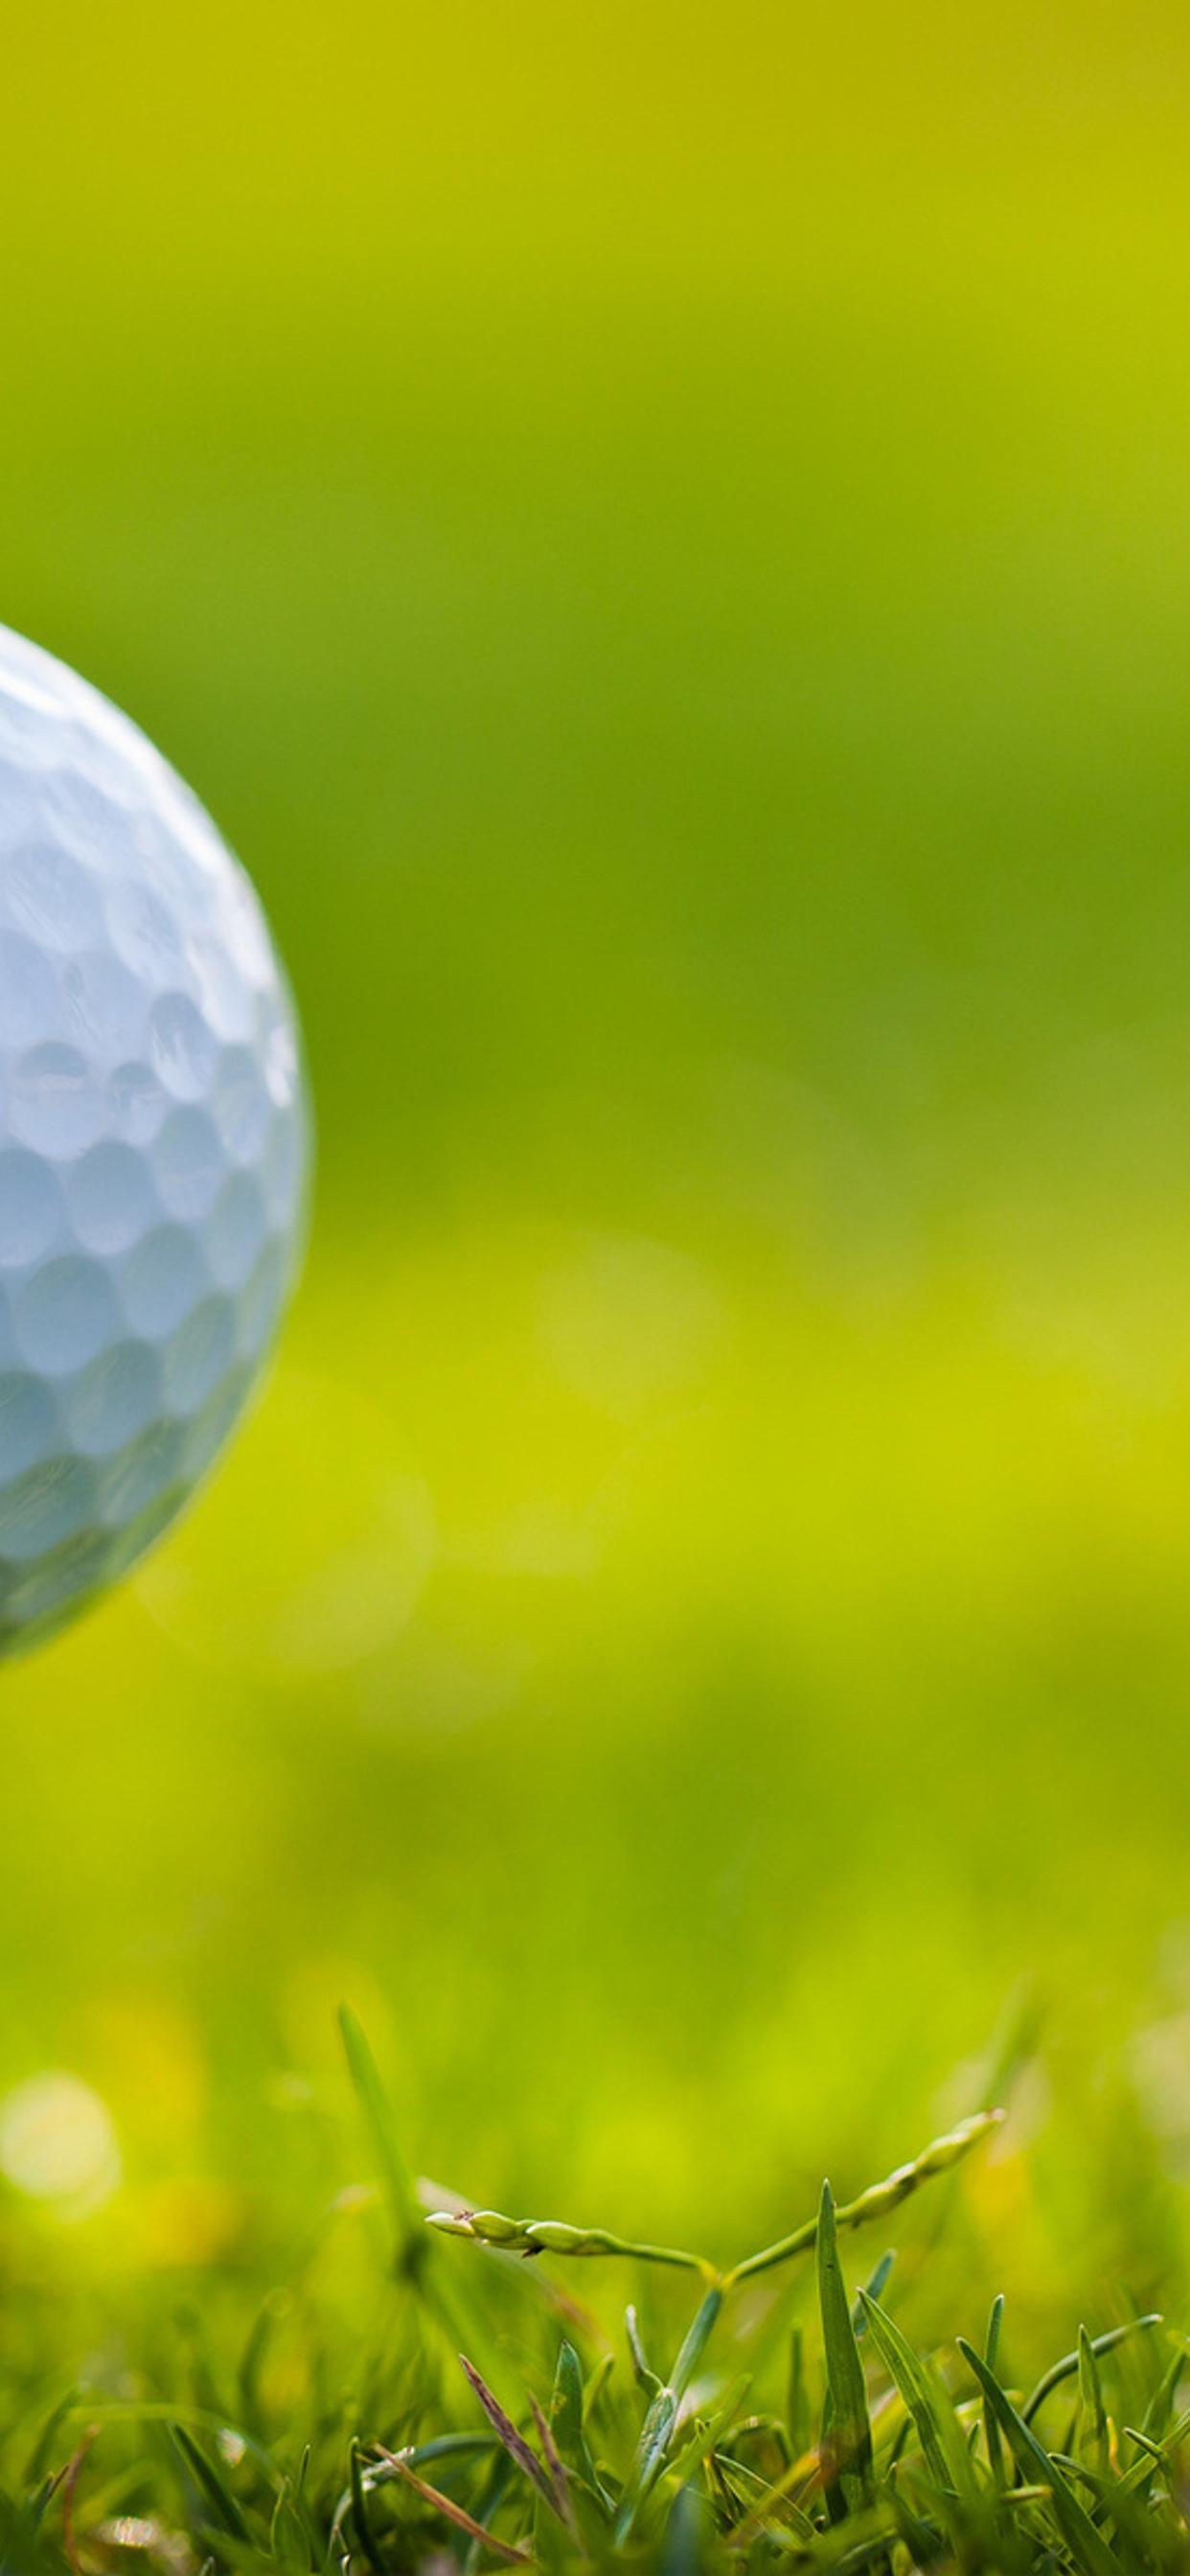 Small Golf Ball On The Green Field Hd Sport Wallpaper